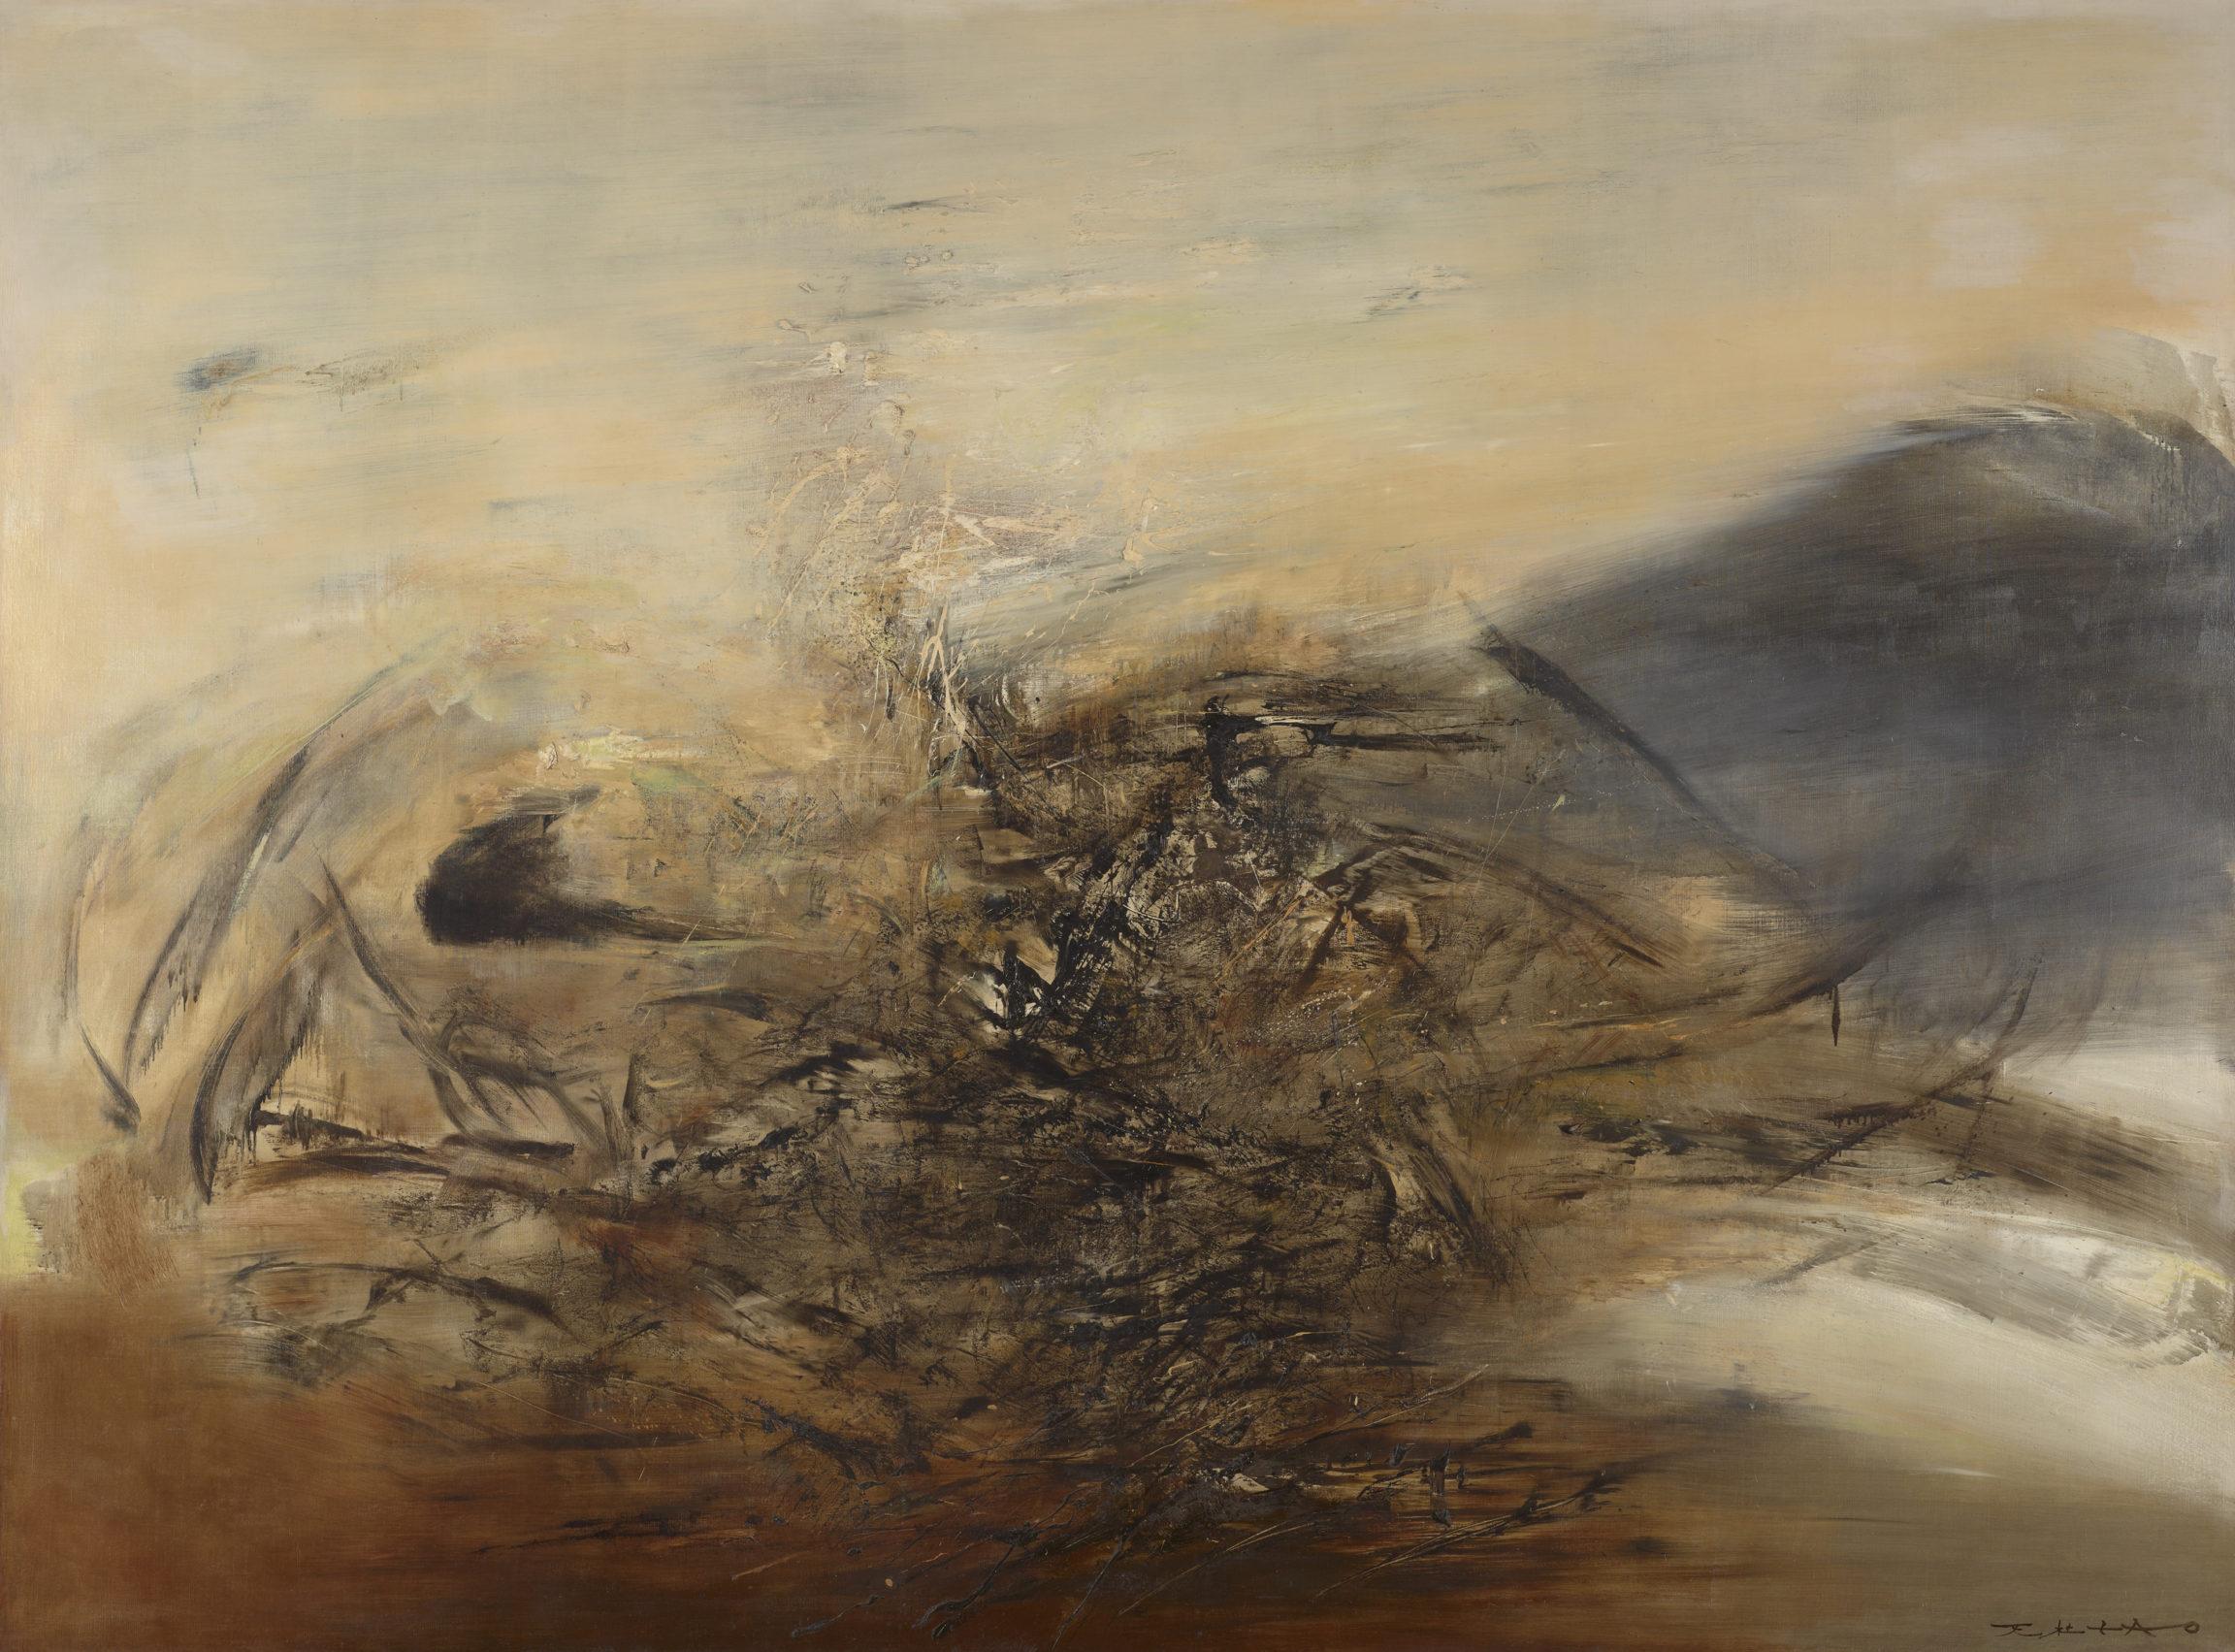 Zao Wou-Ki, Hommage à Edgar Varèse – 15.10.64, 1964